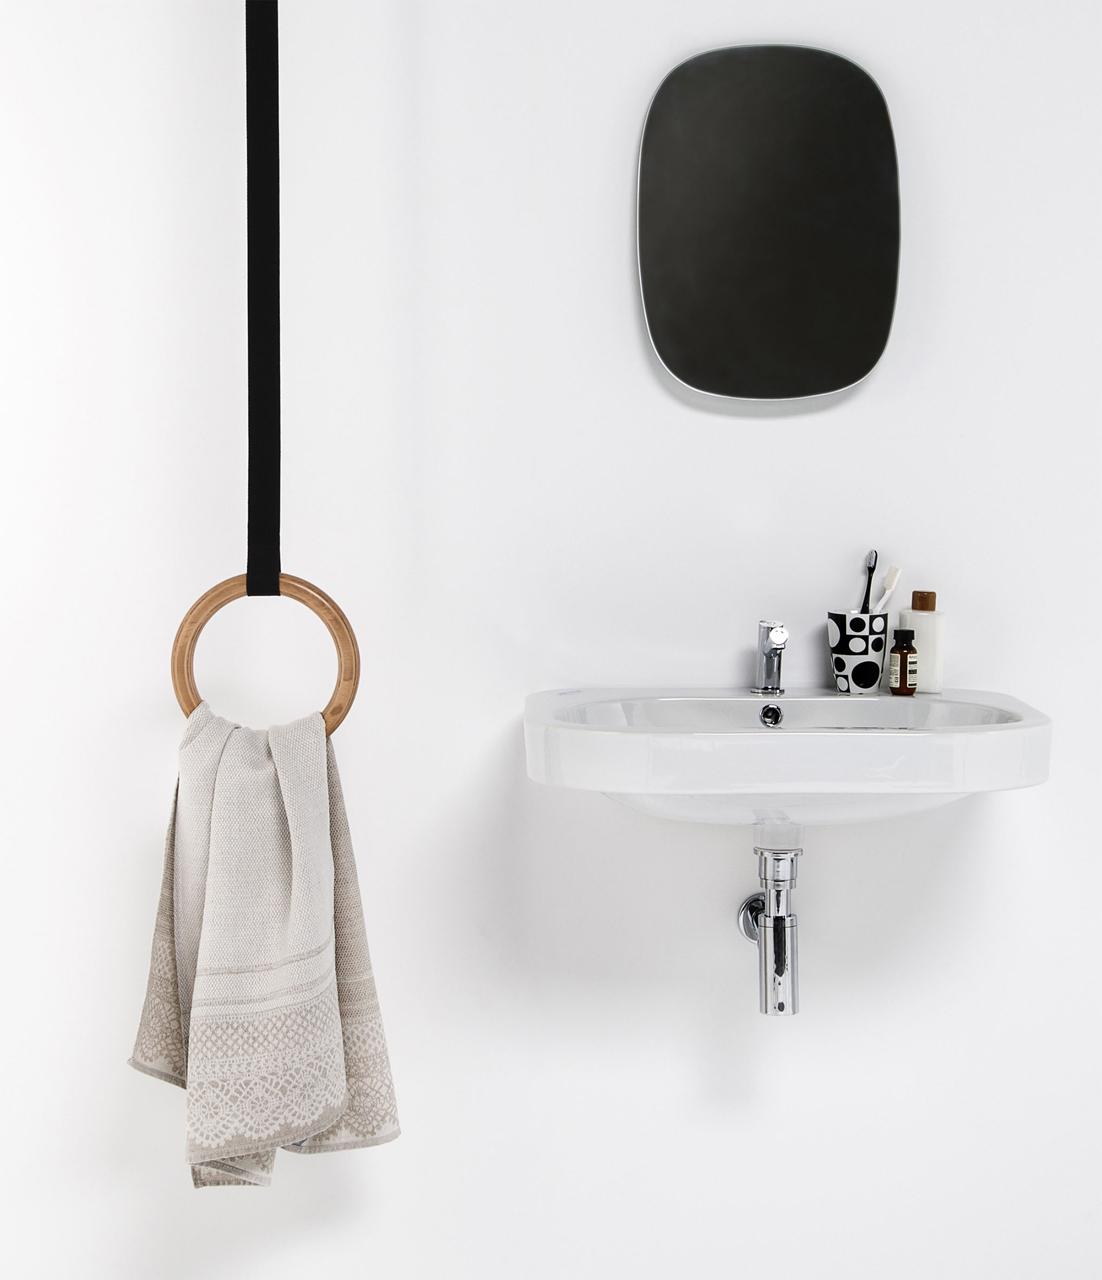 Practical Bathroom Furnishings with a Twist - Design Milk